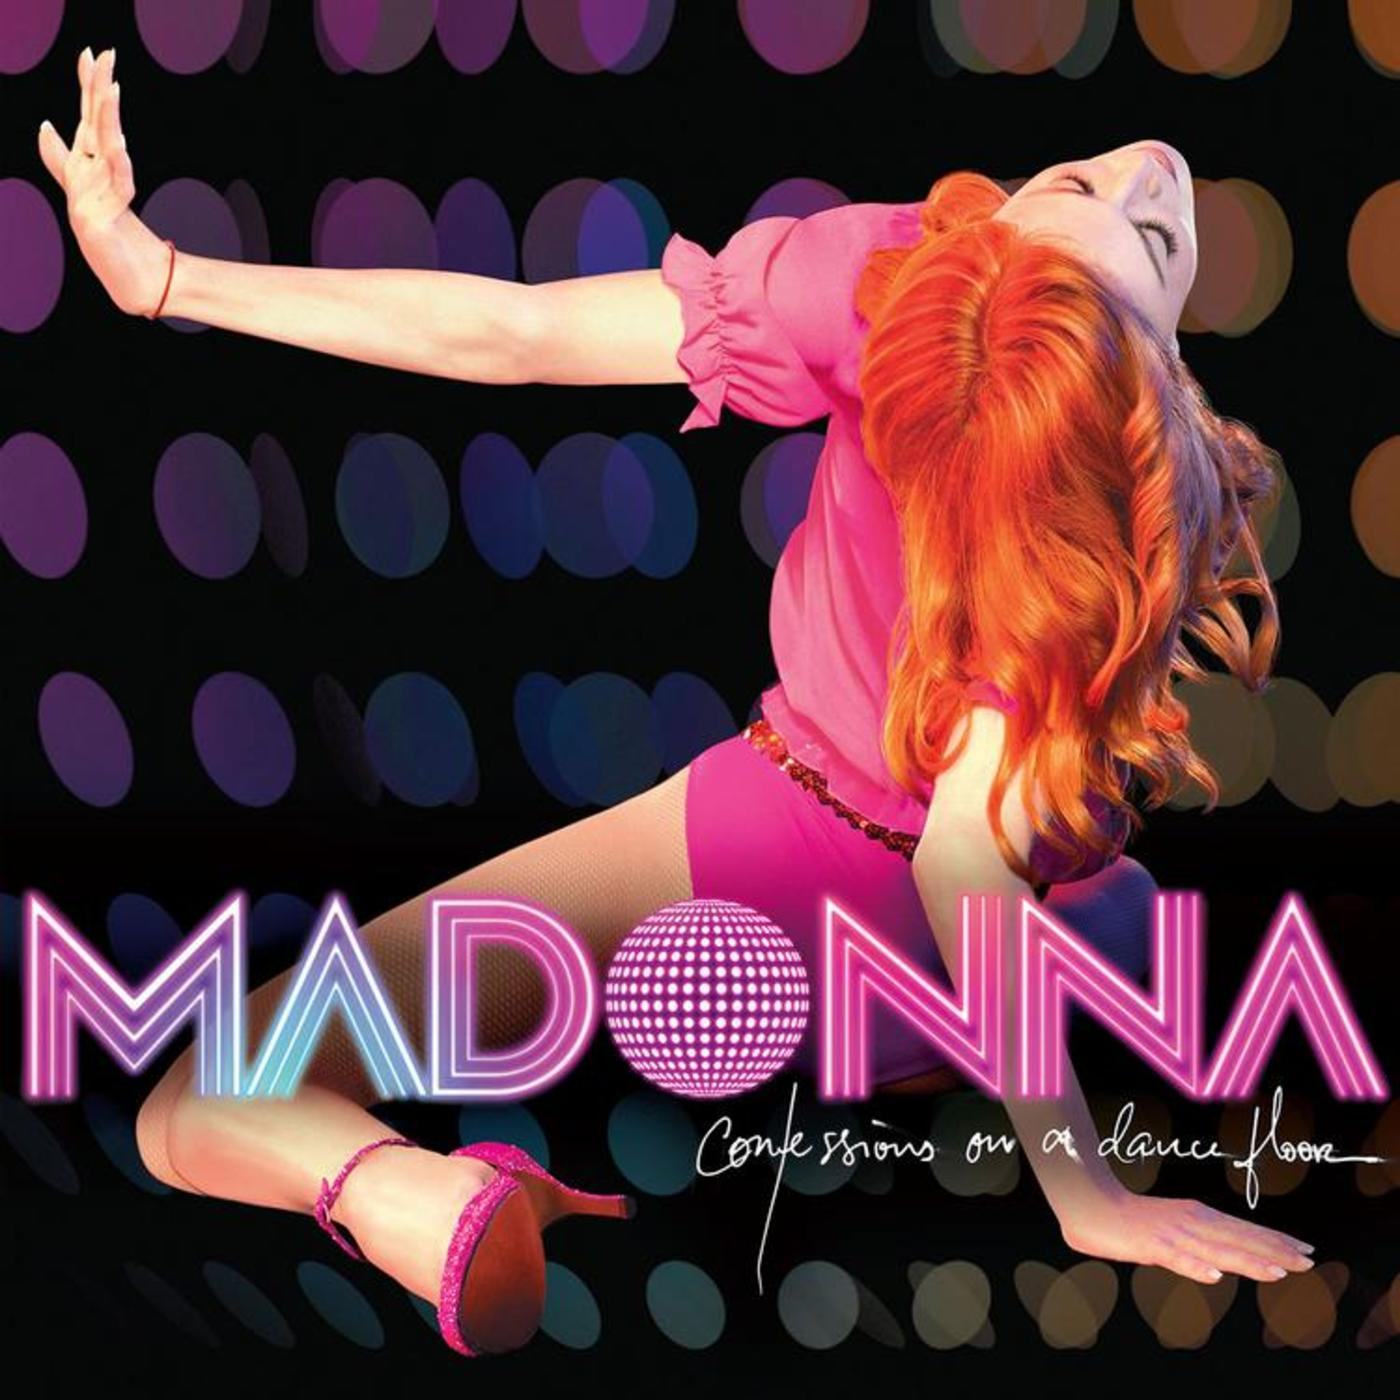 audio review : Confessions On A Dance Floor ( album ) ... Madonna